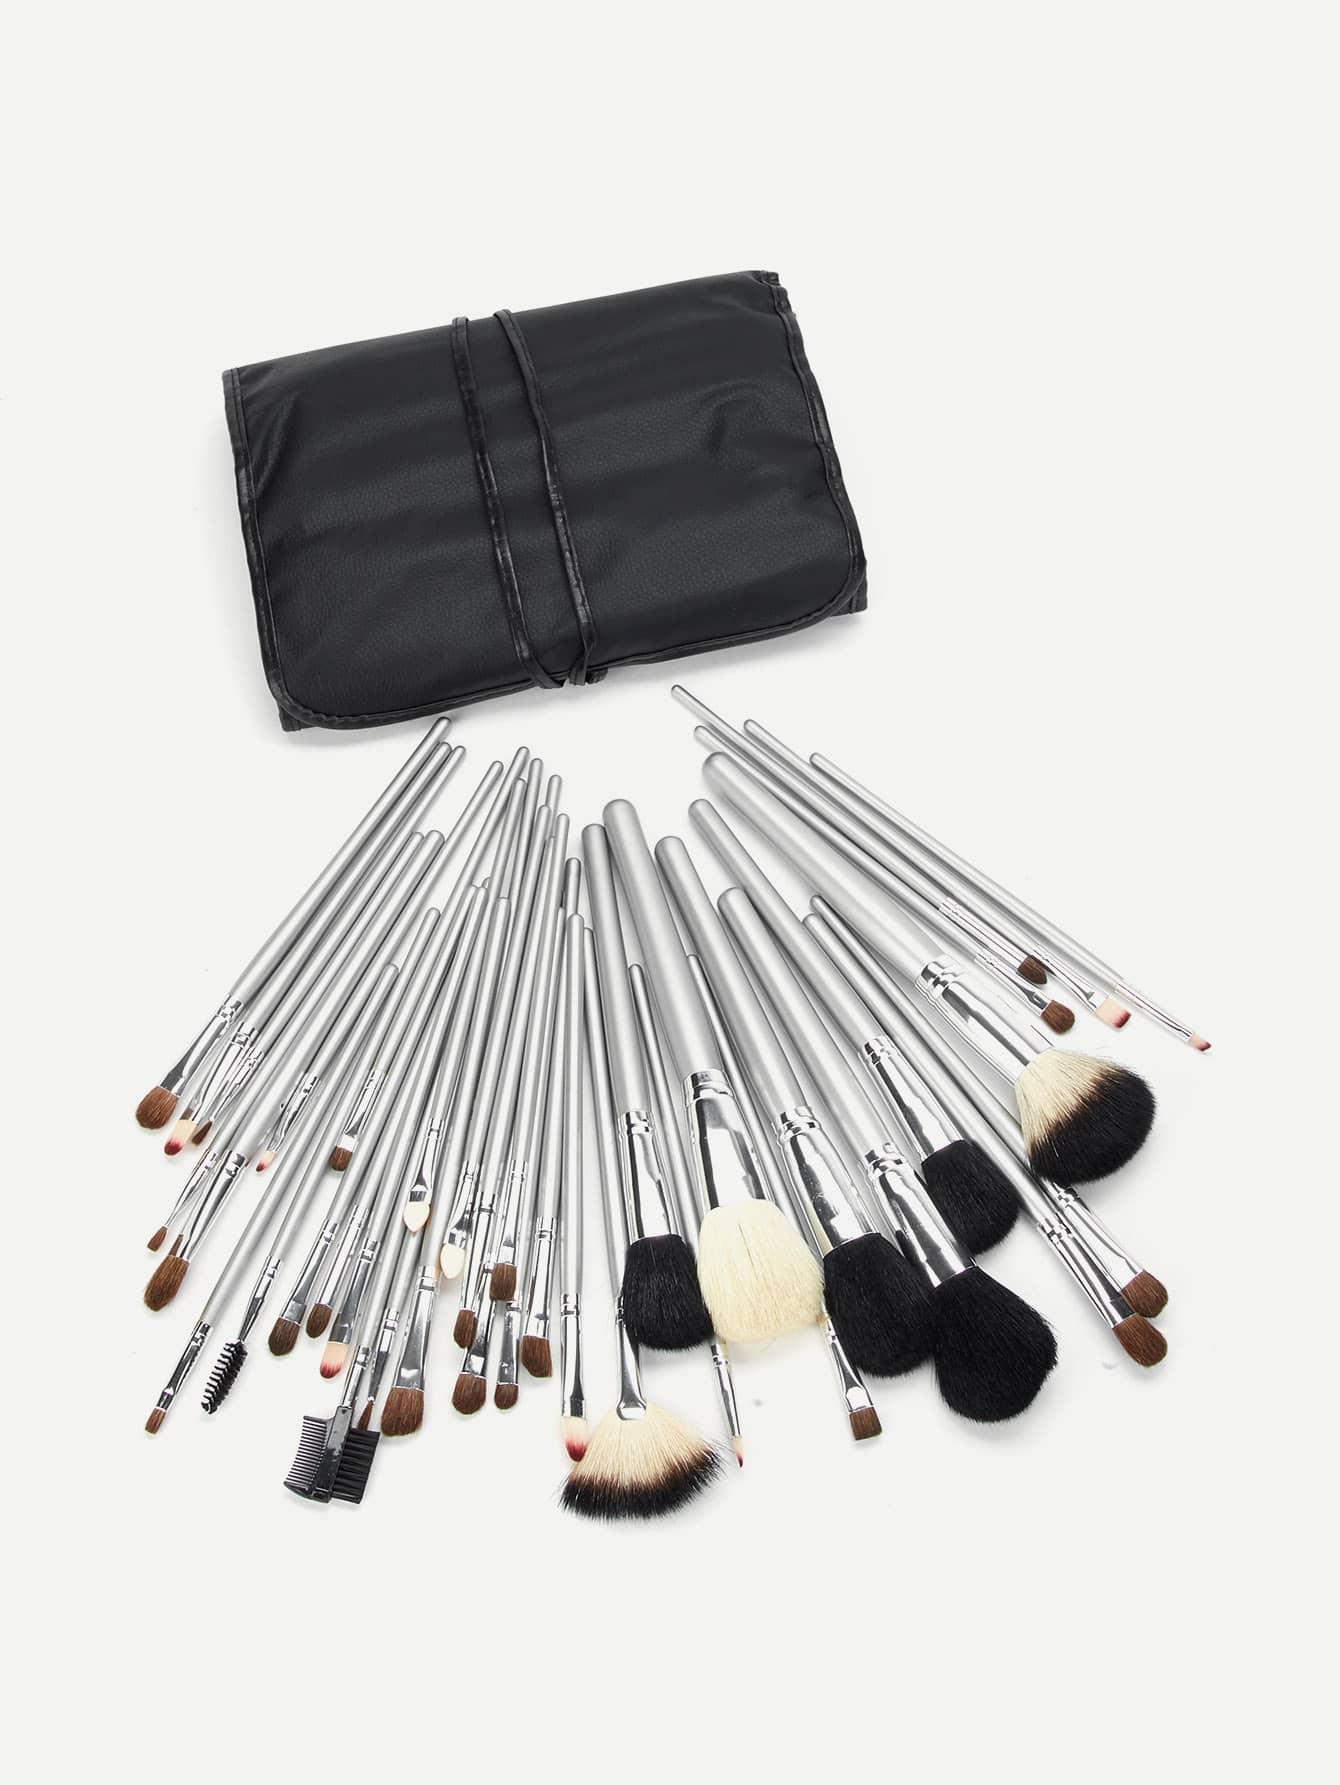 Cosmetic Makeup Brush Set 40Pcs With Bag tube professional 7 in 1 cosmetic makeup brush set w pu case purple